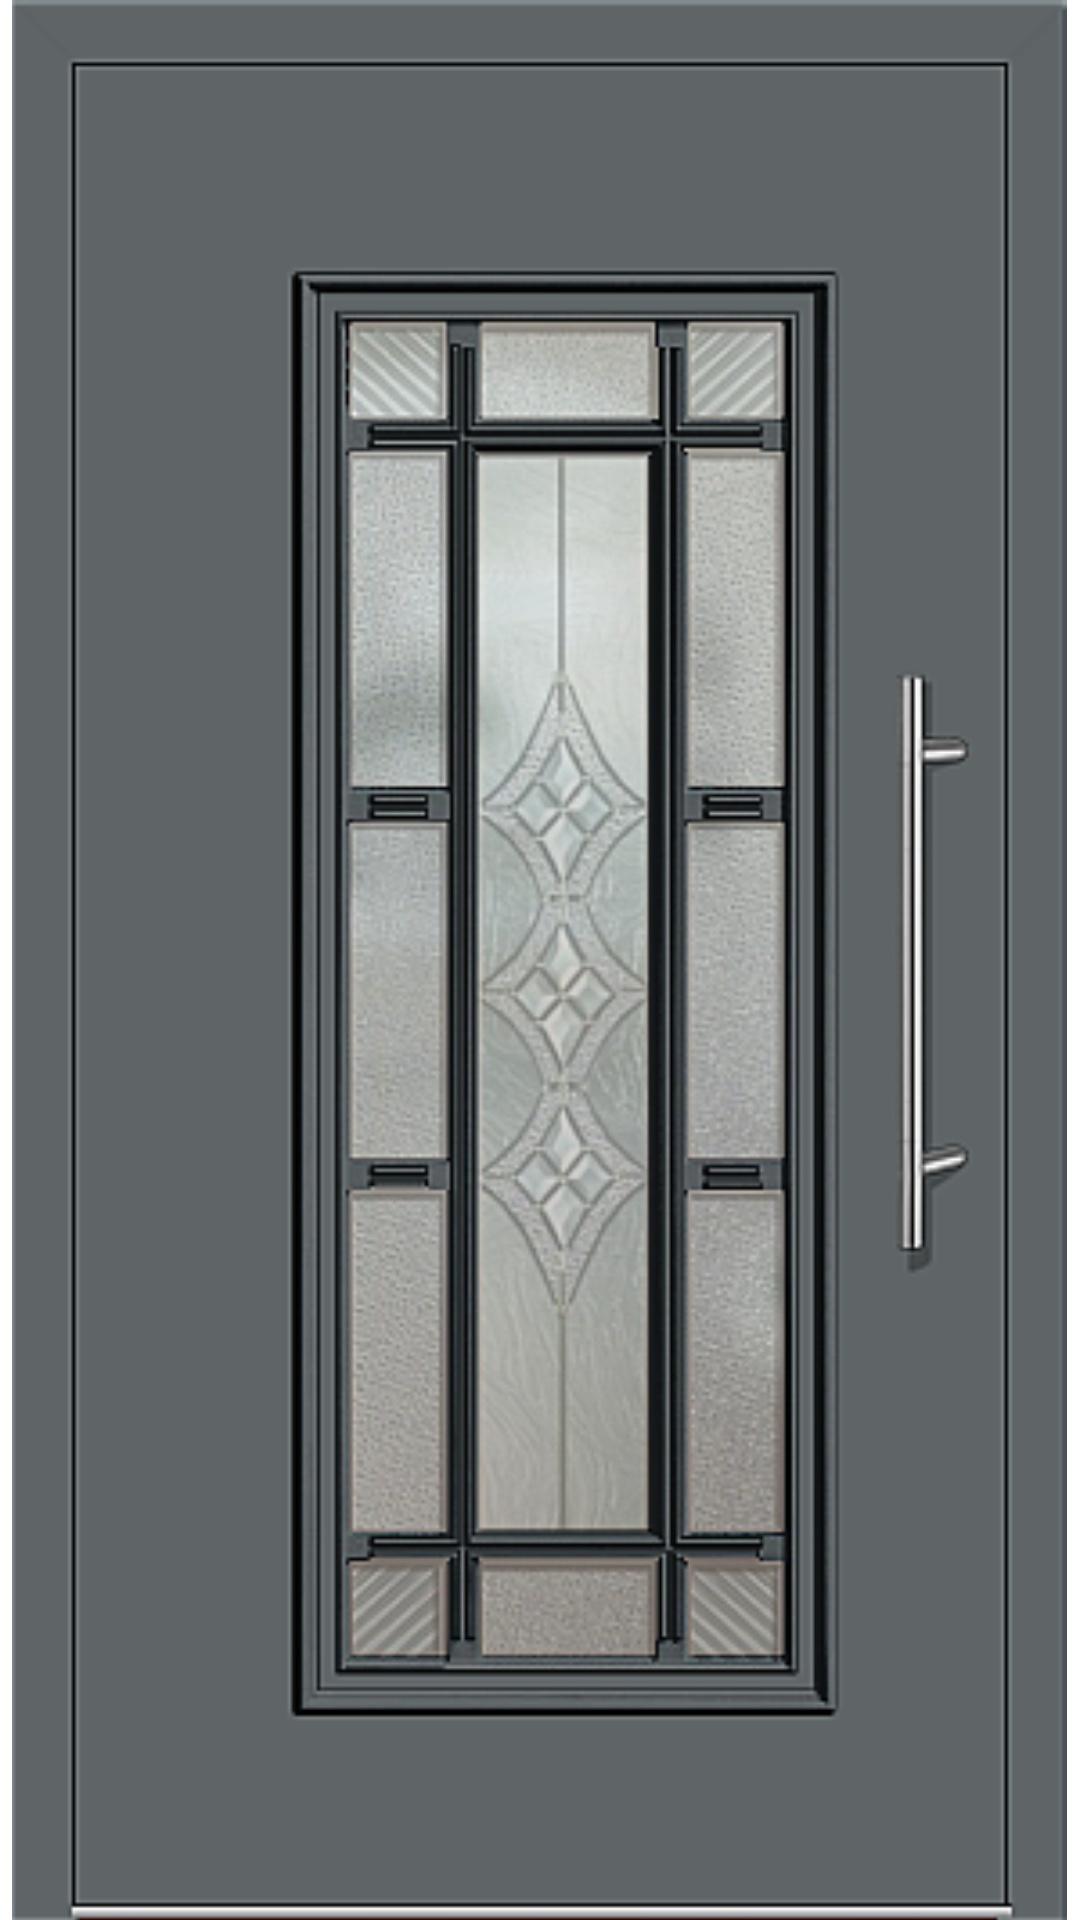 Aluminium Haustür Modell 4151-11 basaltgrau